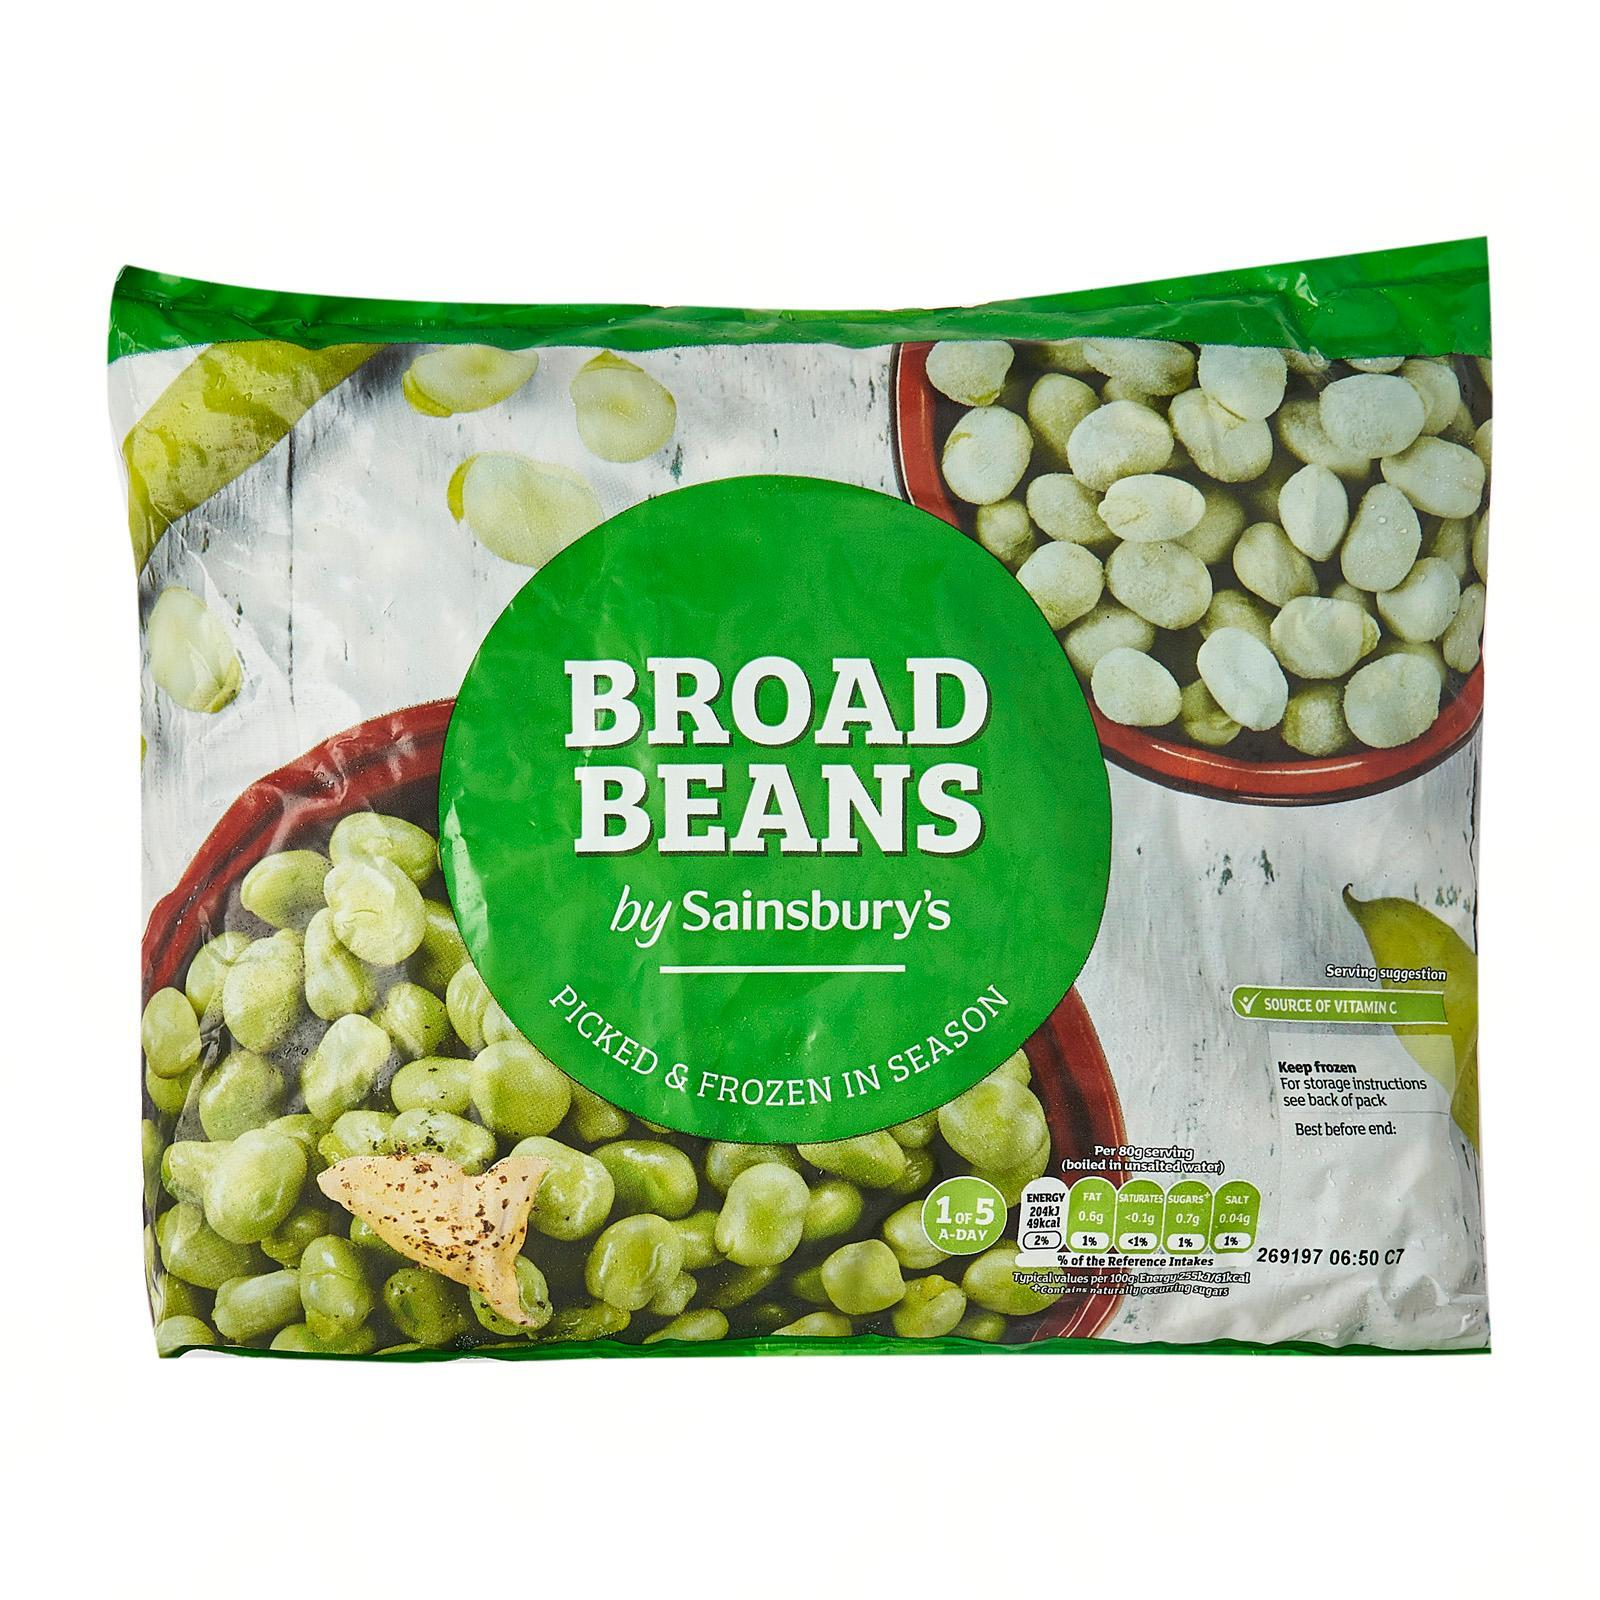 Sainsbury's Broad Beans - Frozen